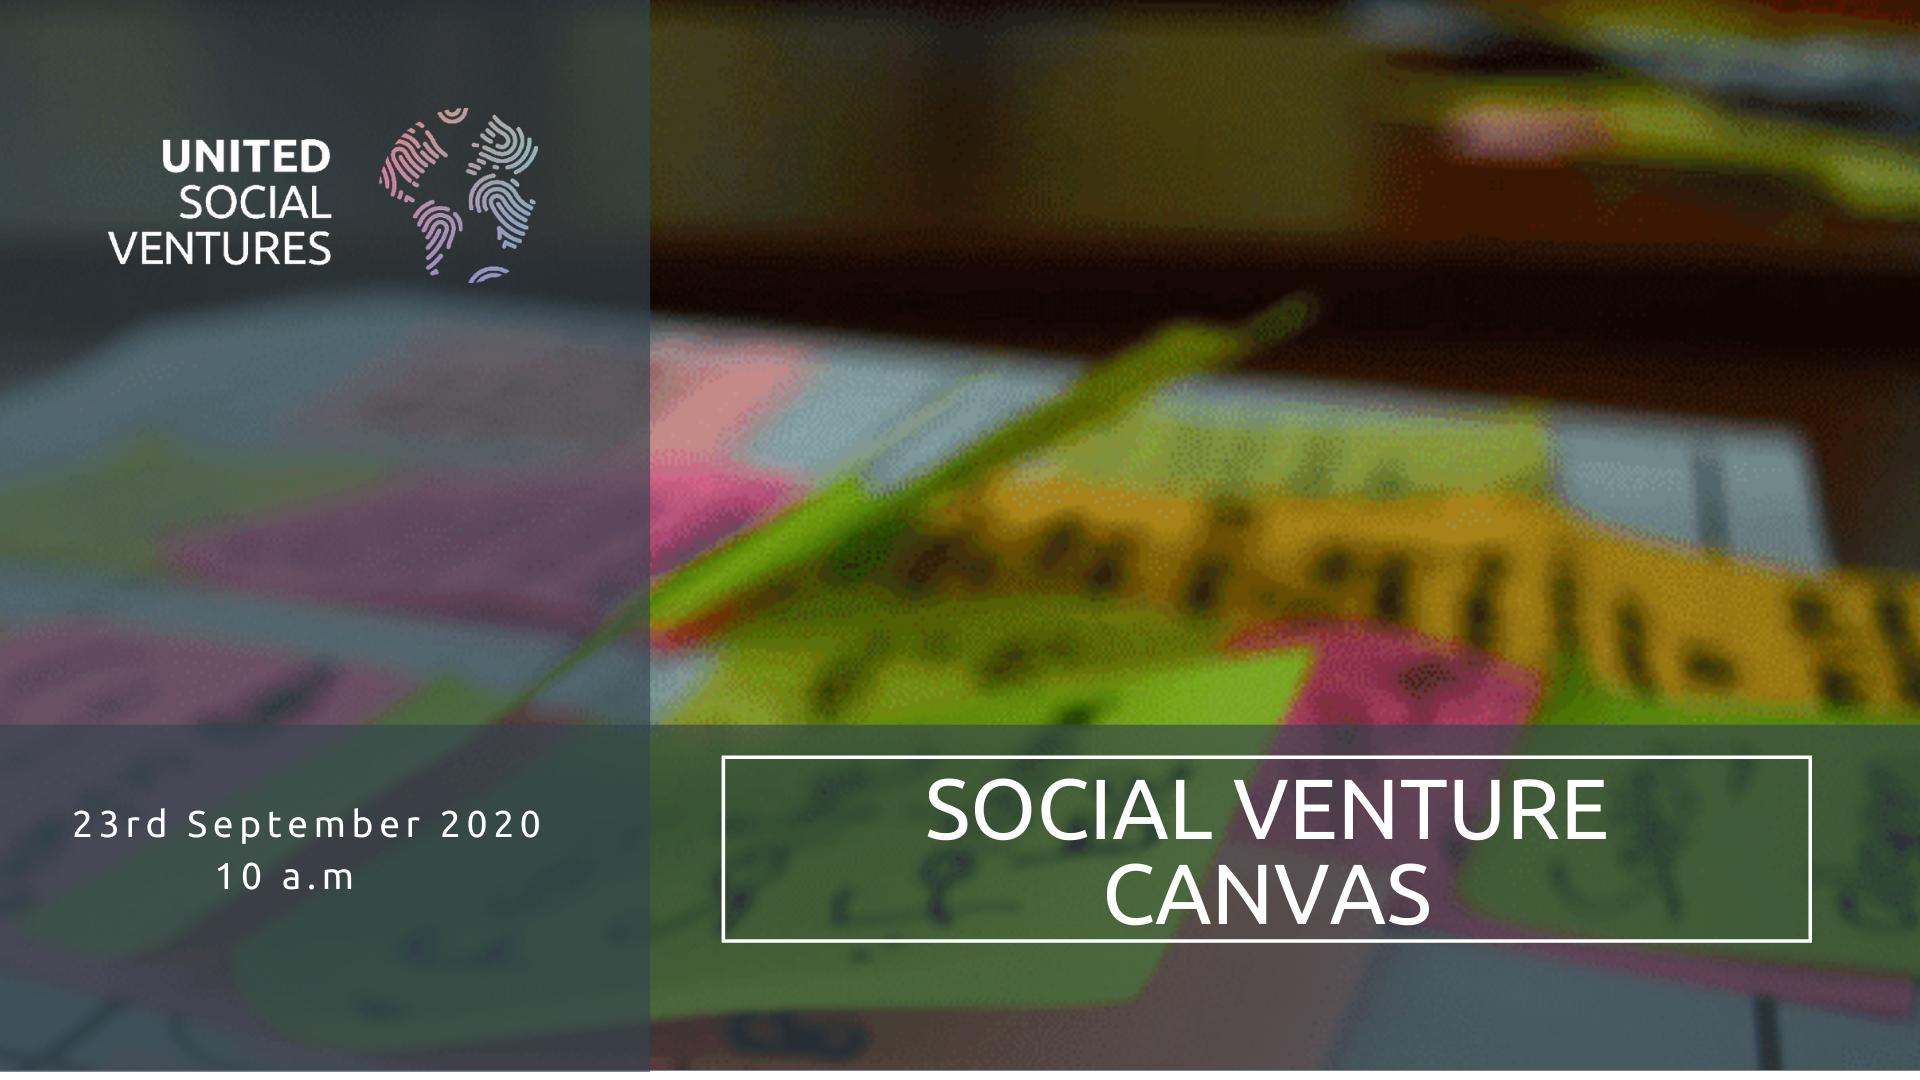 Social venture canvas (1)